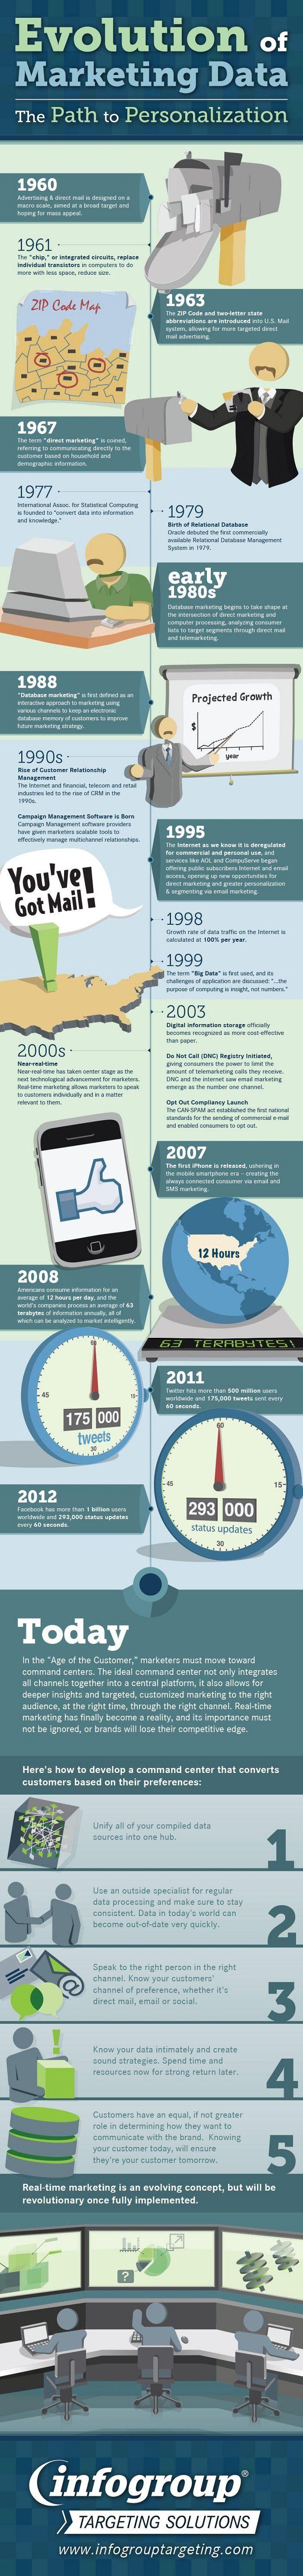 Metrics & ROI - The Evolution of Marketing Data [Infographic] : MarketingProfs Article